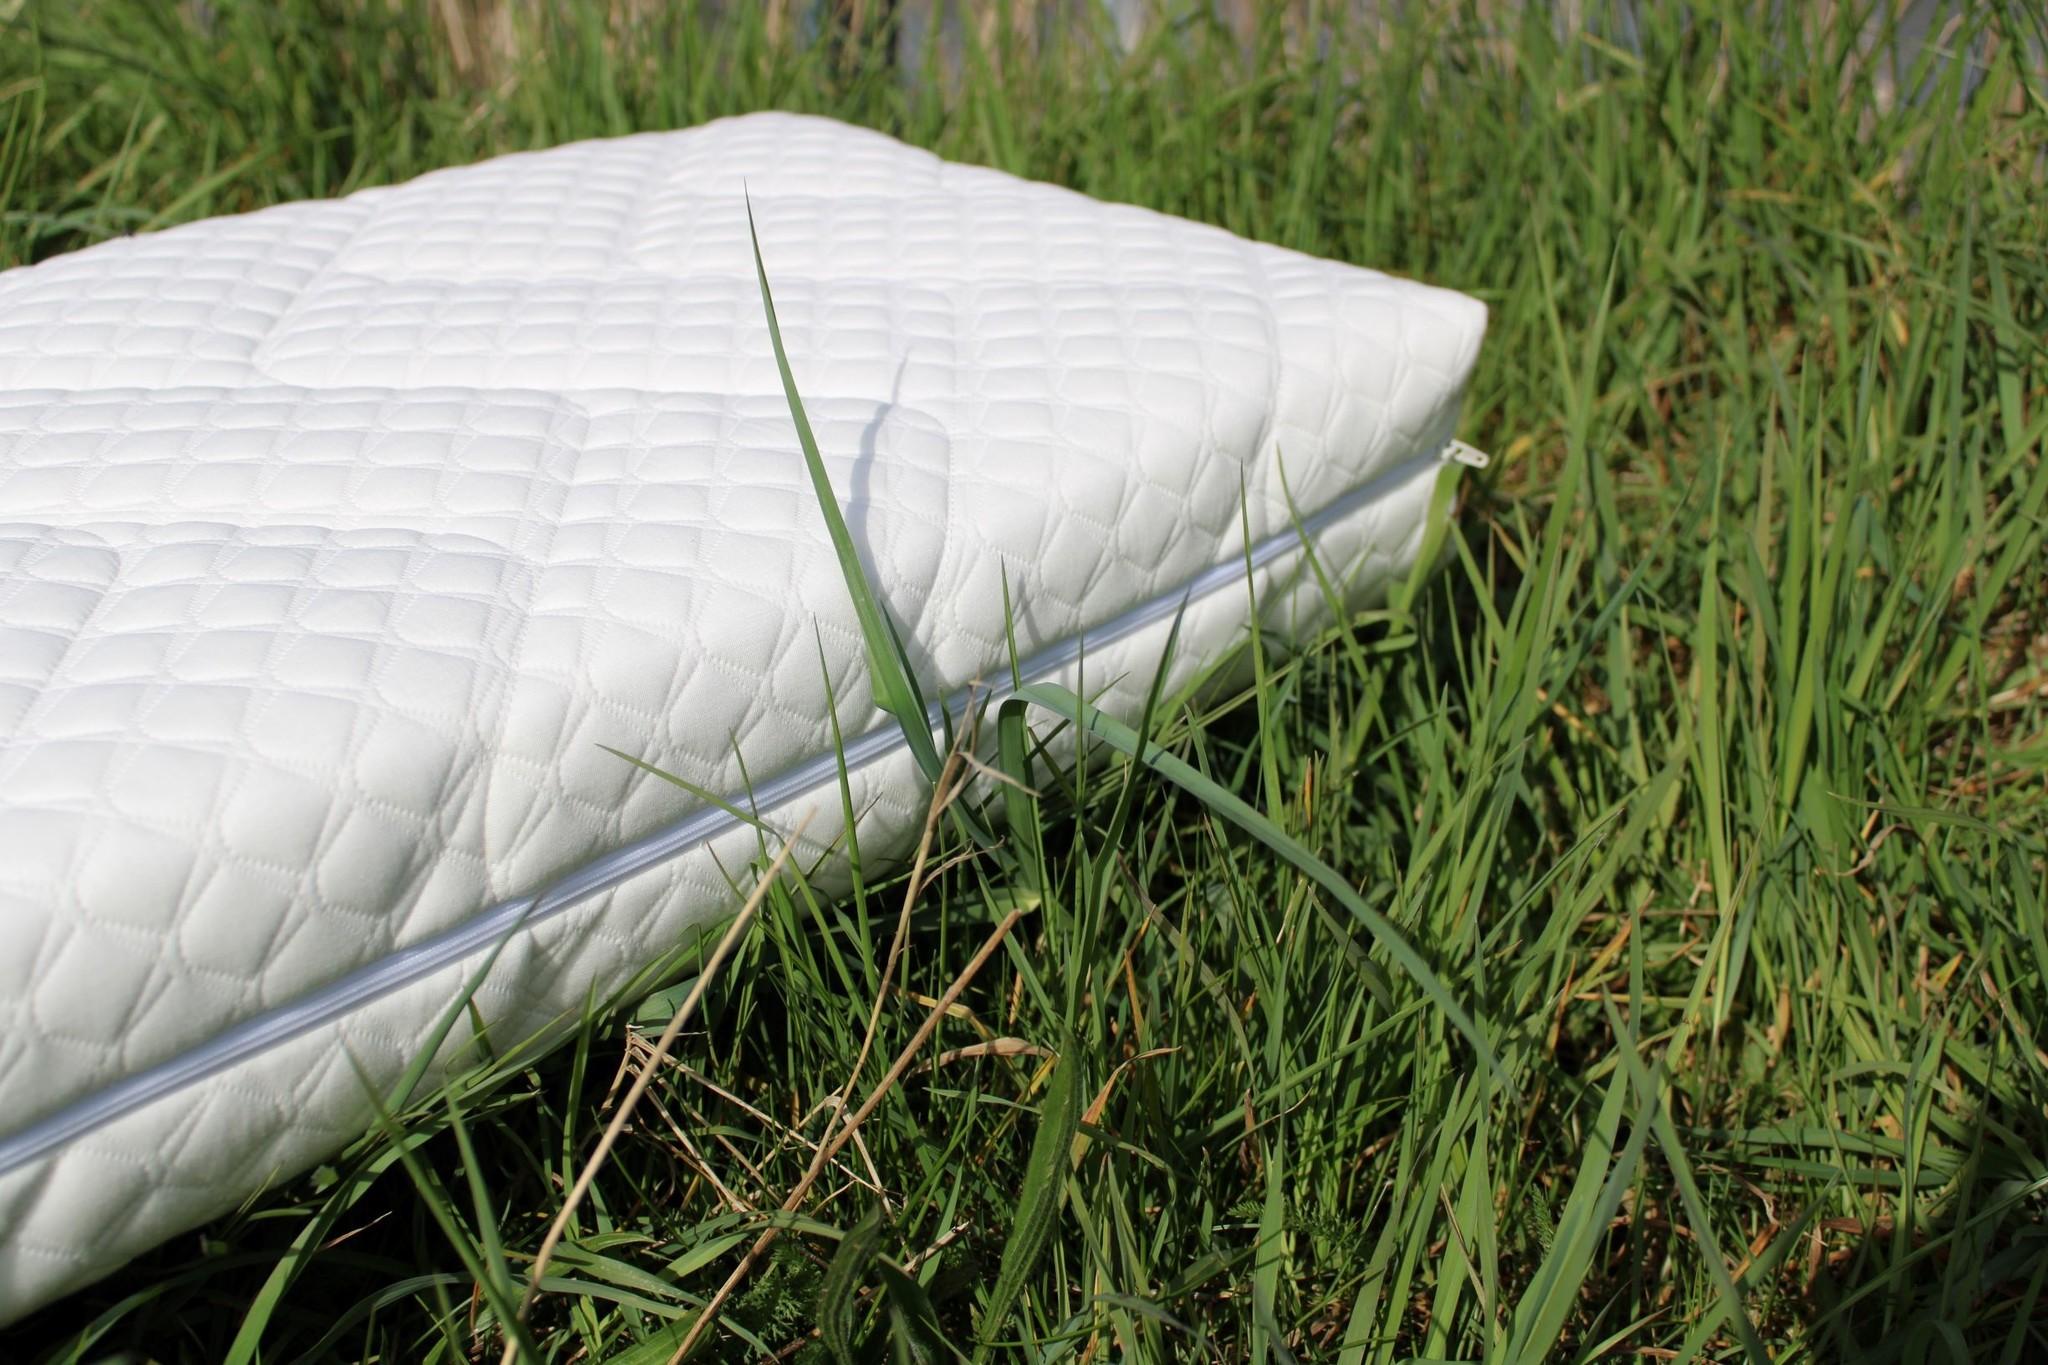 Sarpy Kindermatras 90x170 Sertel Tailor Made Mattress